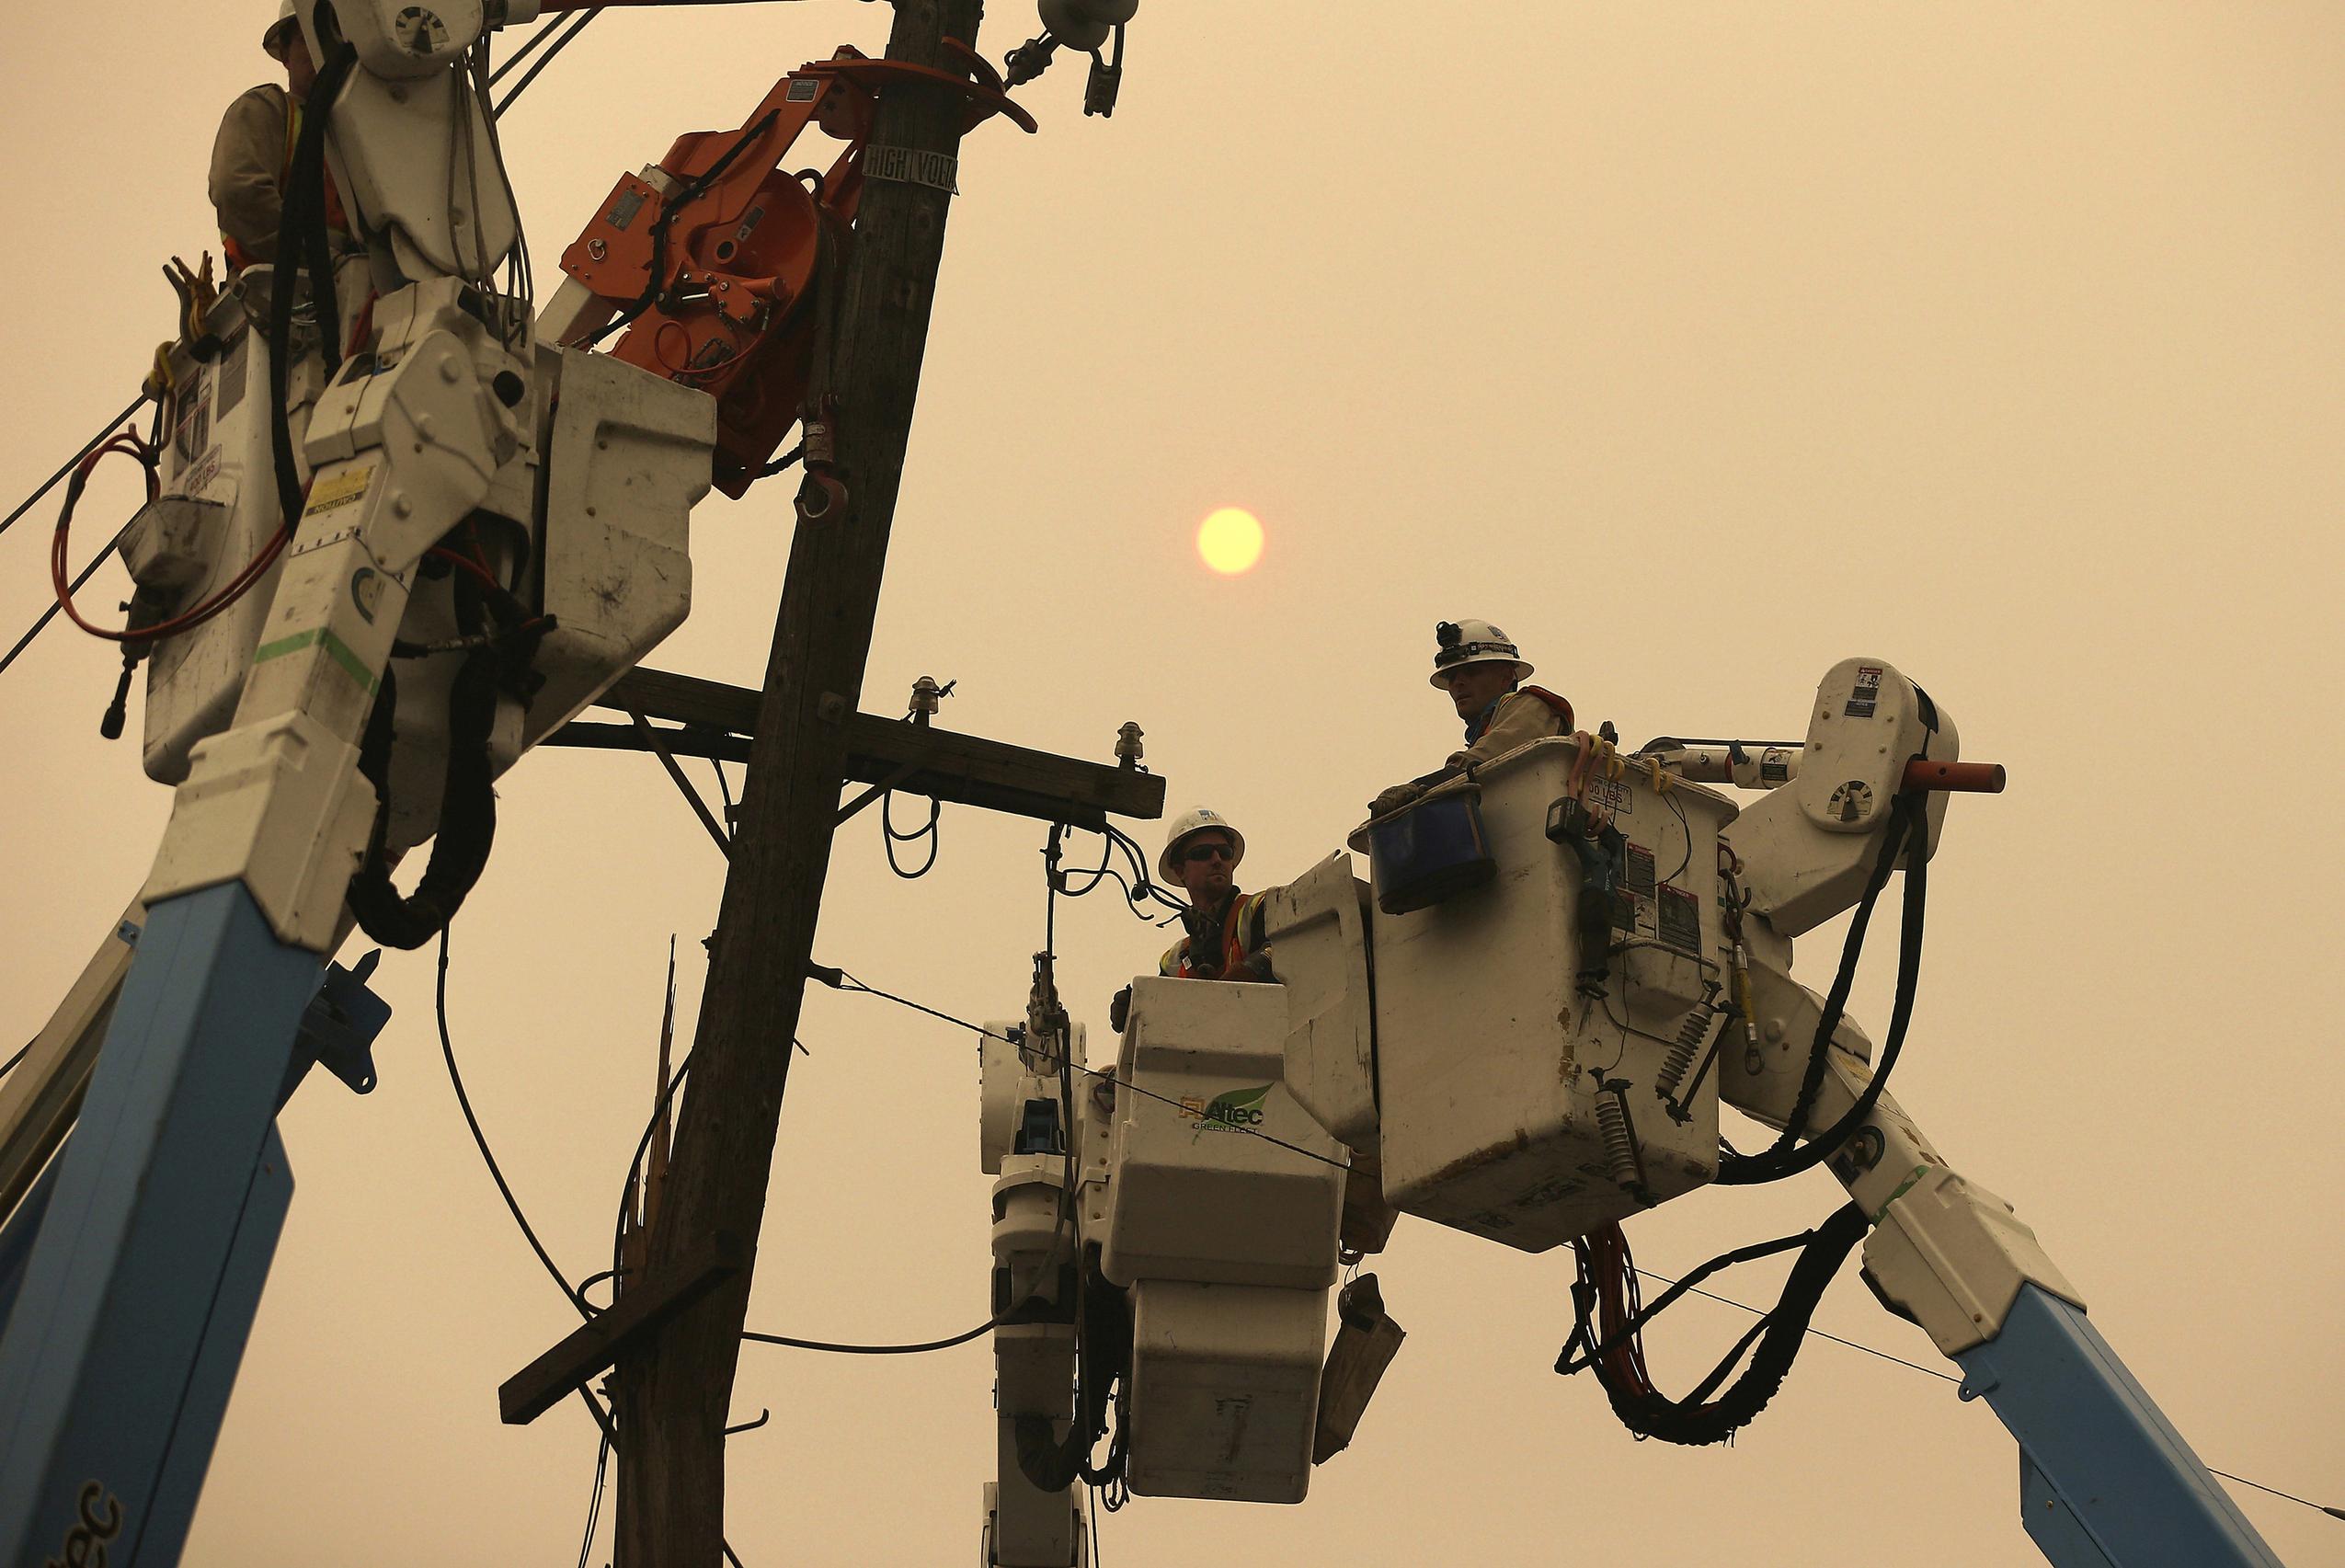 PG&E says San Francisco, northern California to lose power